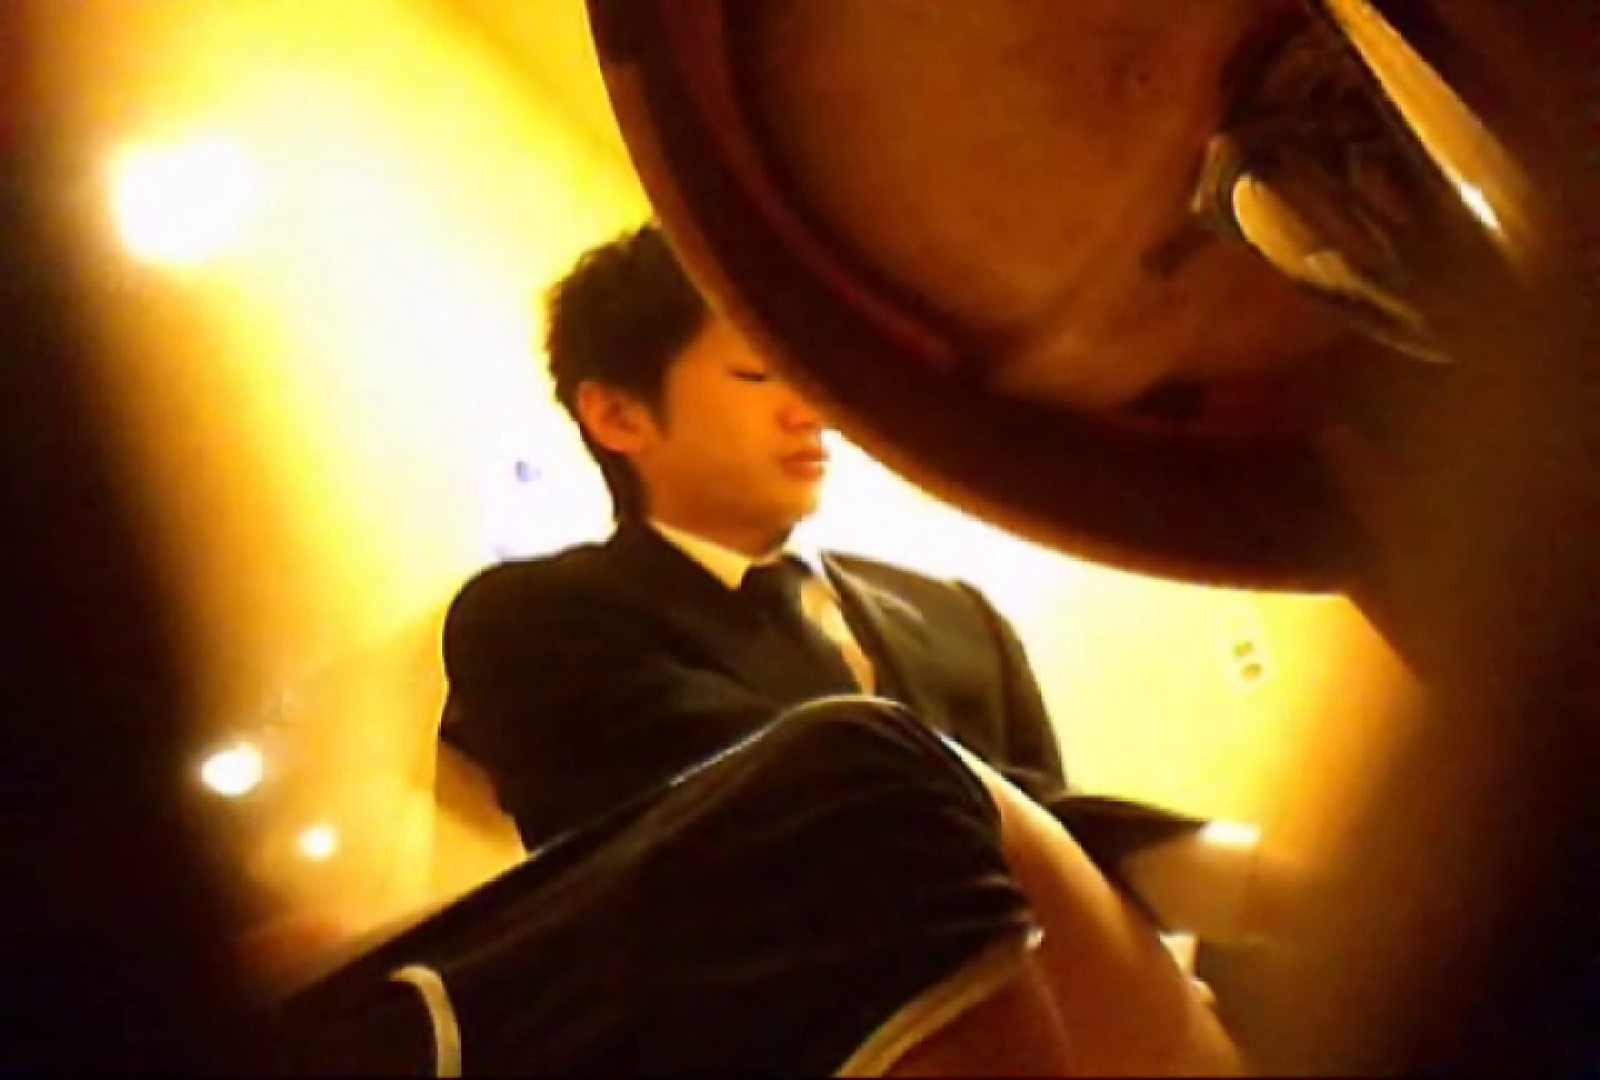 SEASON 3rd!掴み取りさんの洗面所覗き!in新幹線!VOL.23 念願の完全無修正 ゲイAV画像 69連発 10